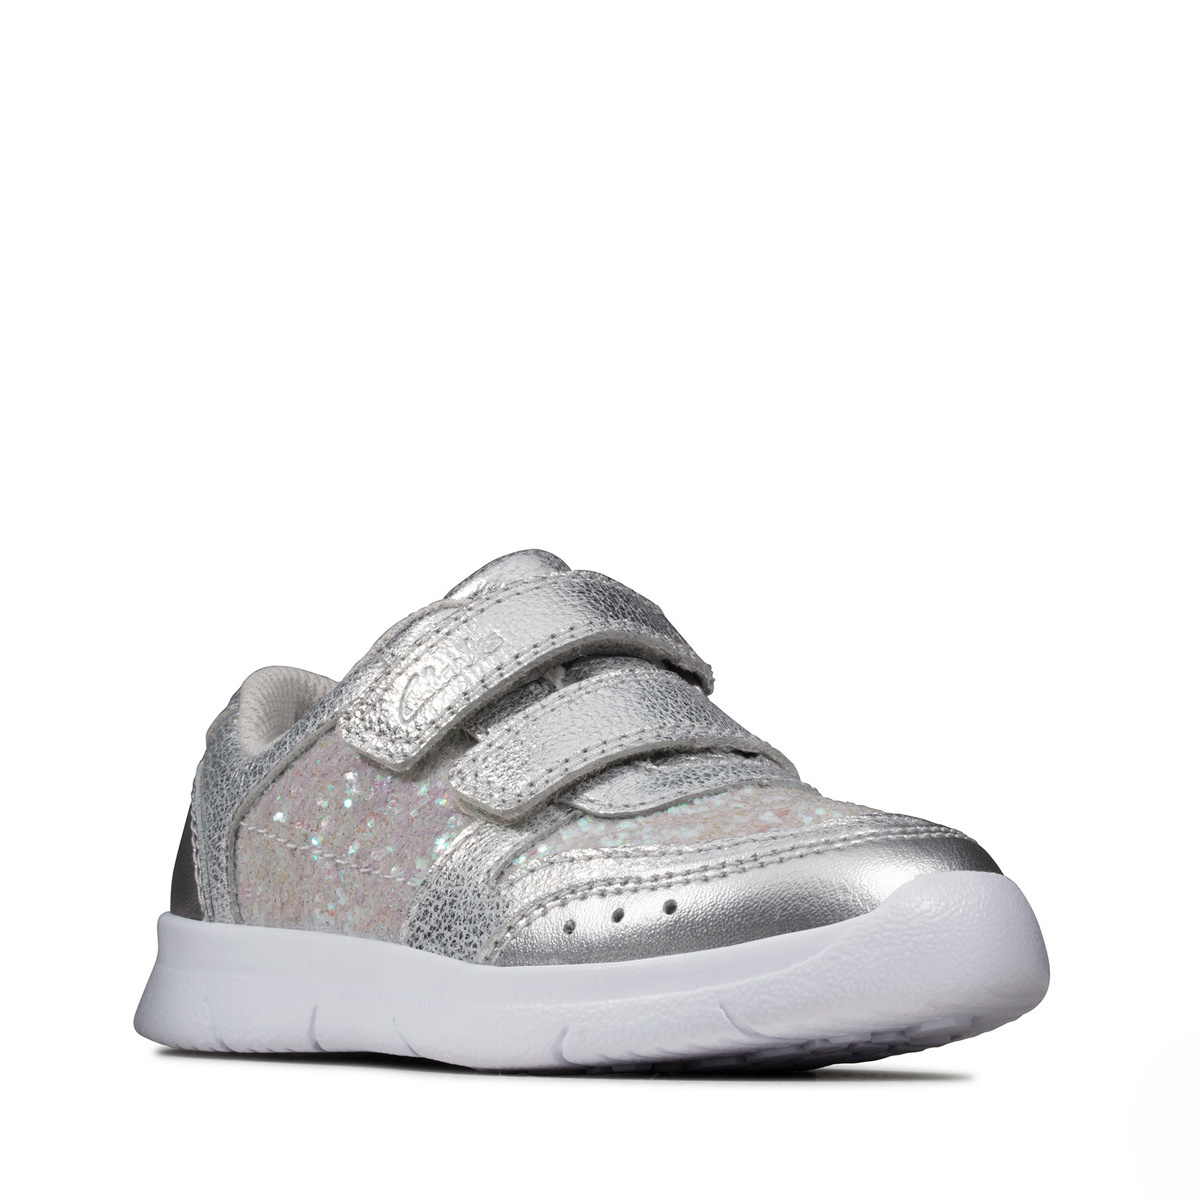 Clarks Ath Sonar Silver Infant